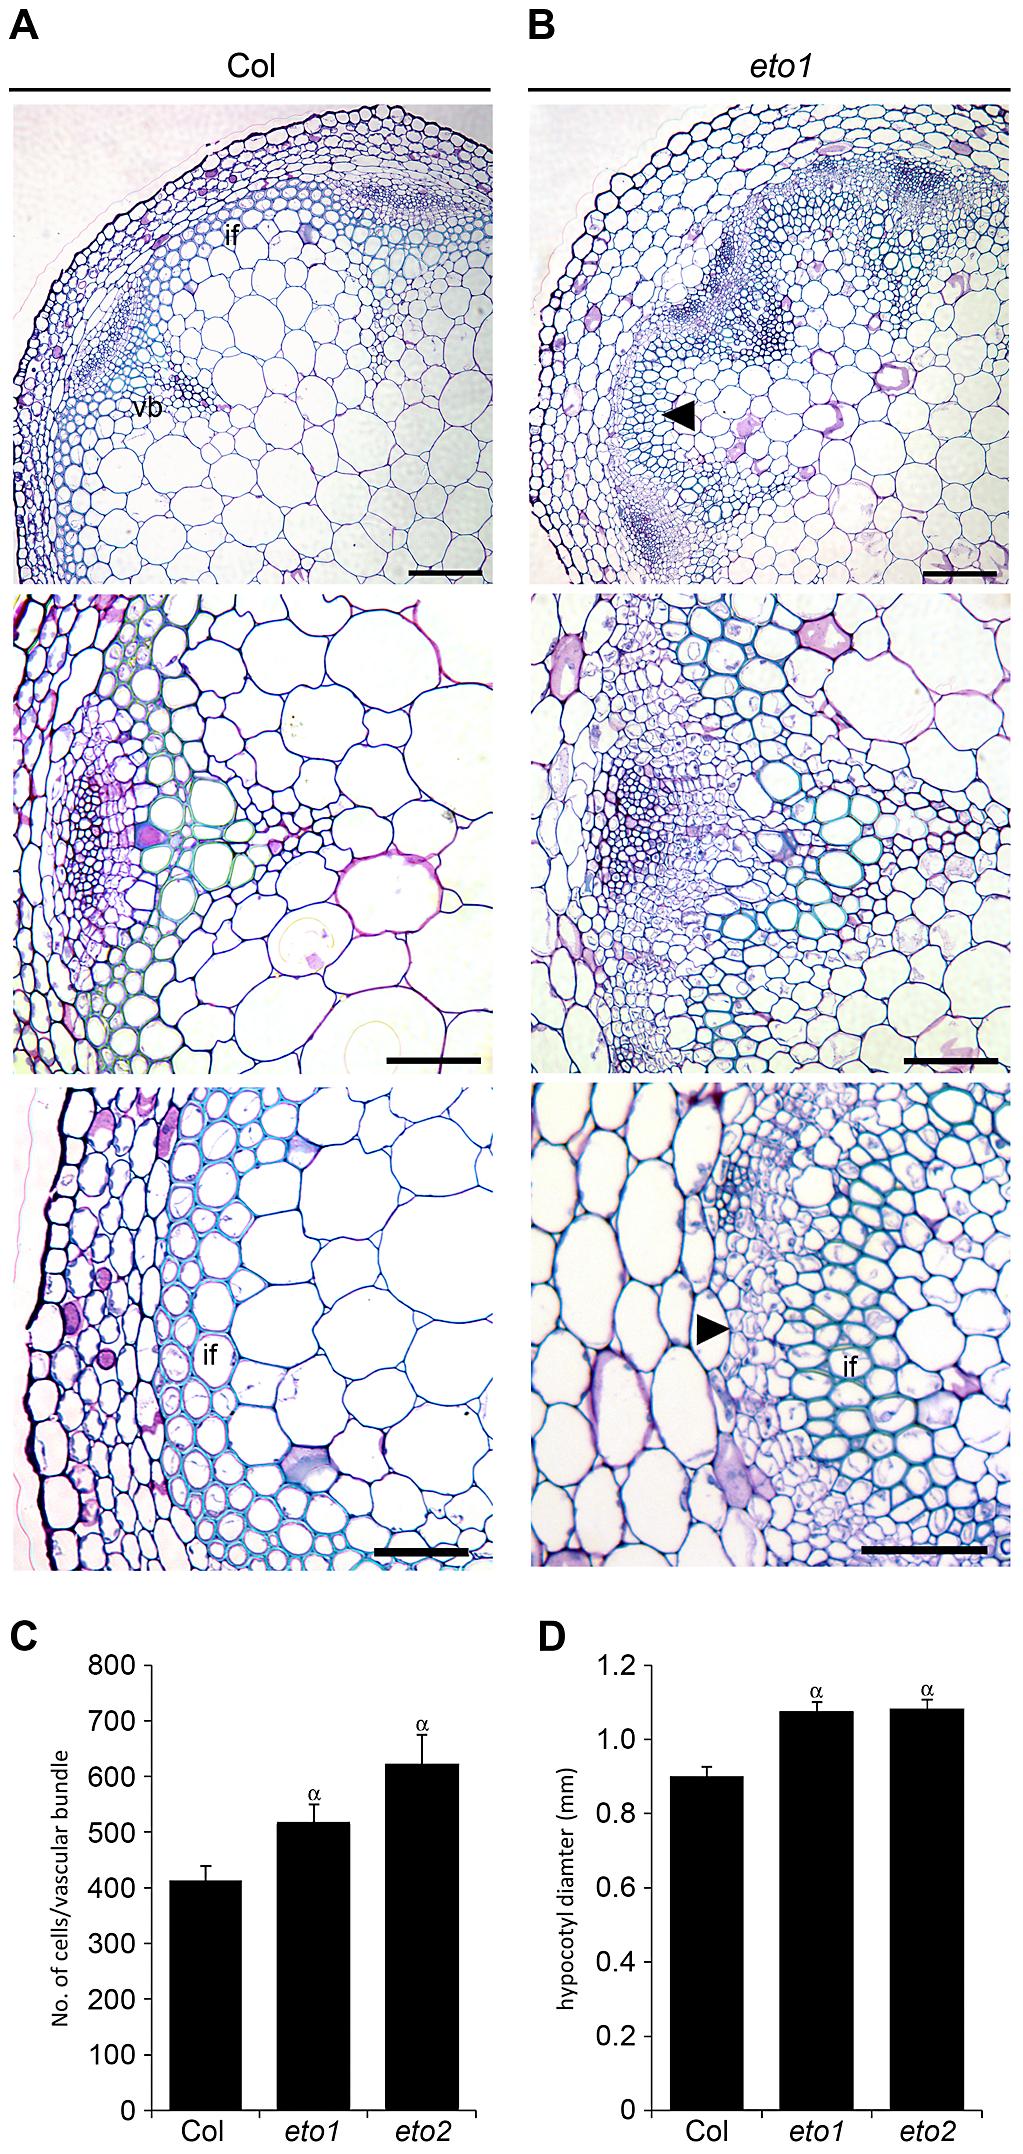 Increased vascular cell divisions in <i>eto1</i> and <i>eto2</i> mutants.